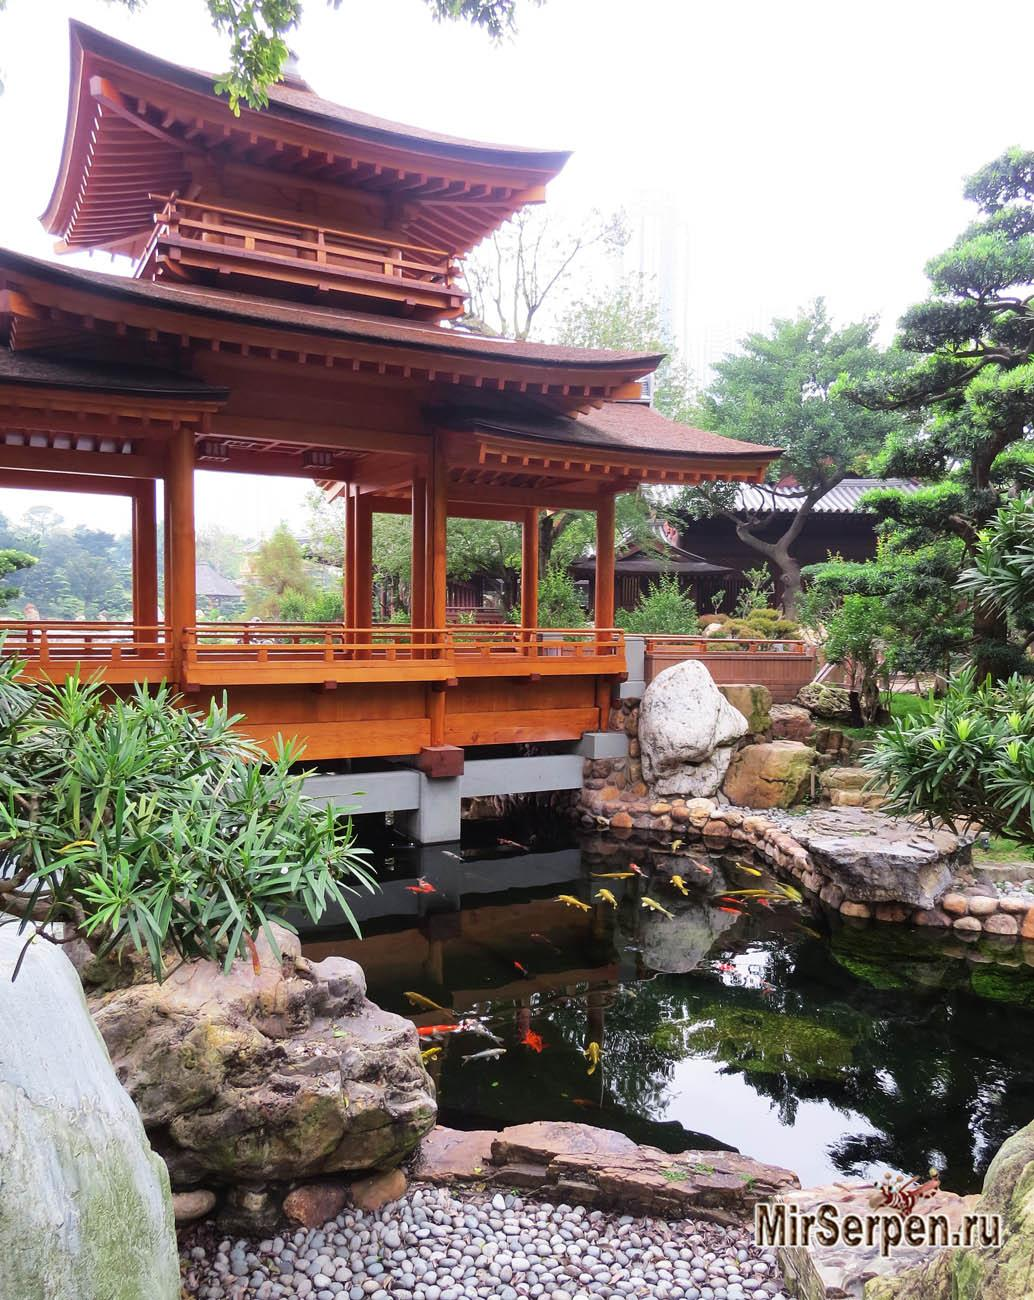 Photo of Сад Нан-Лиан: дыхание китайской культуры